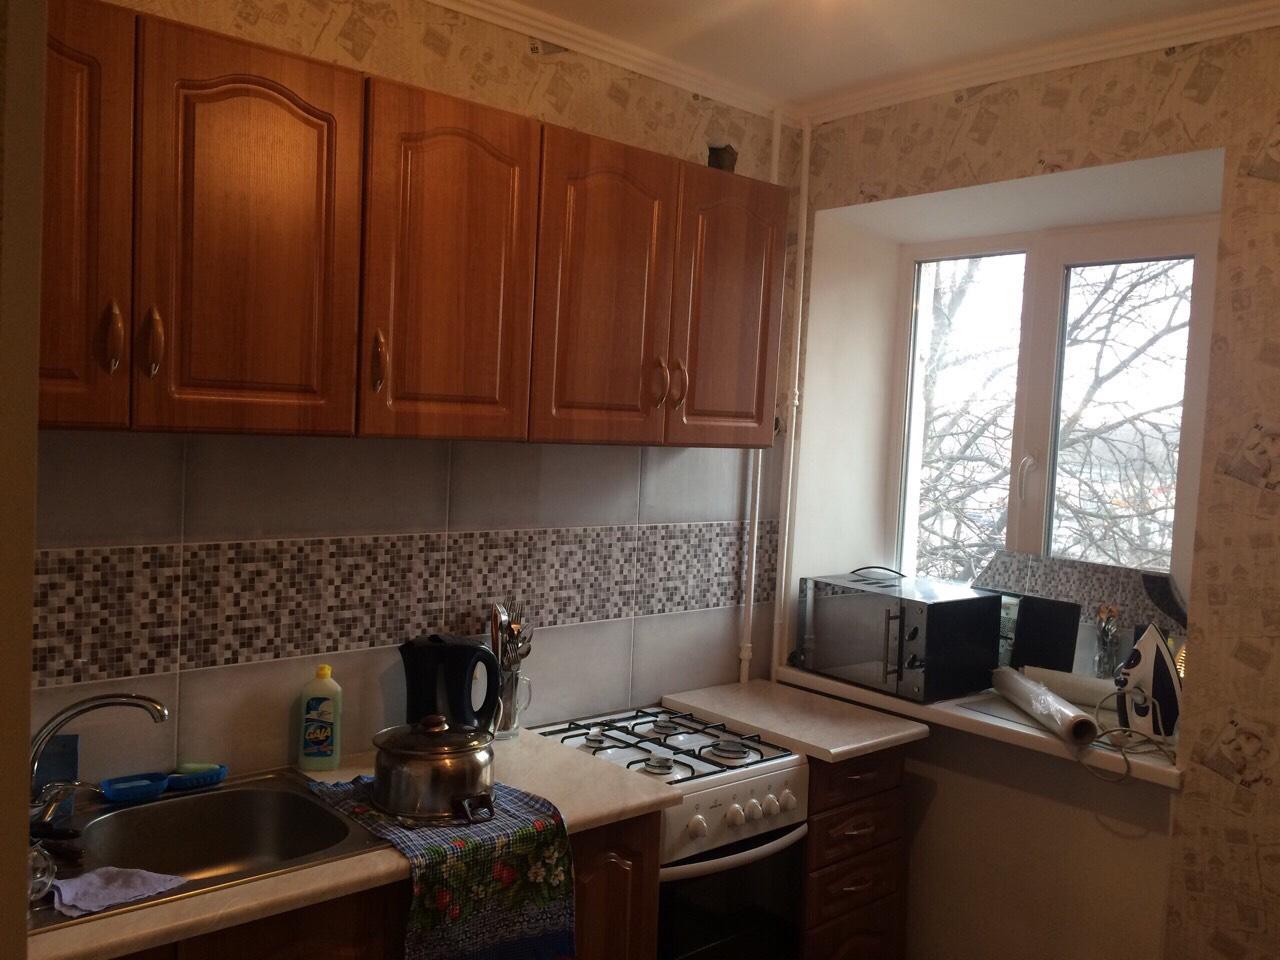 Продается 1-комнатная Квартира на ул. Инглези (25 Чапаевской Див.) — 29 900 у.е. (фото №3)